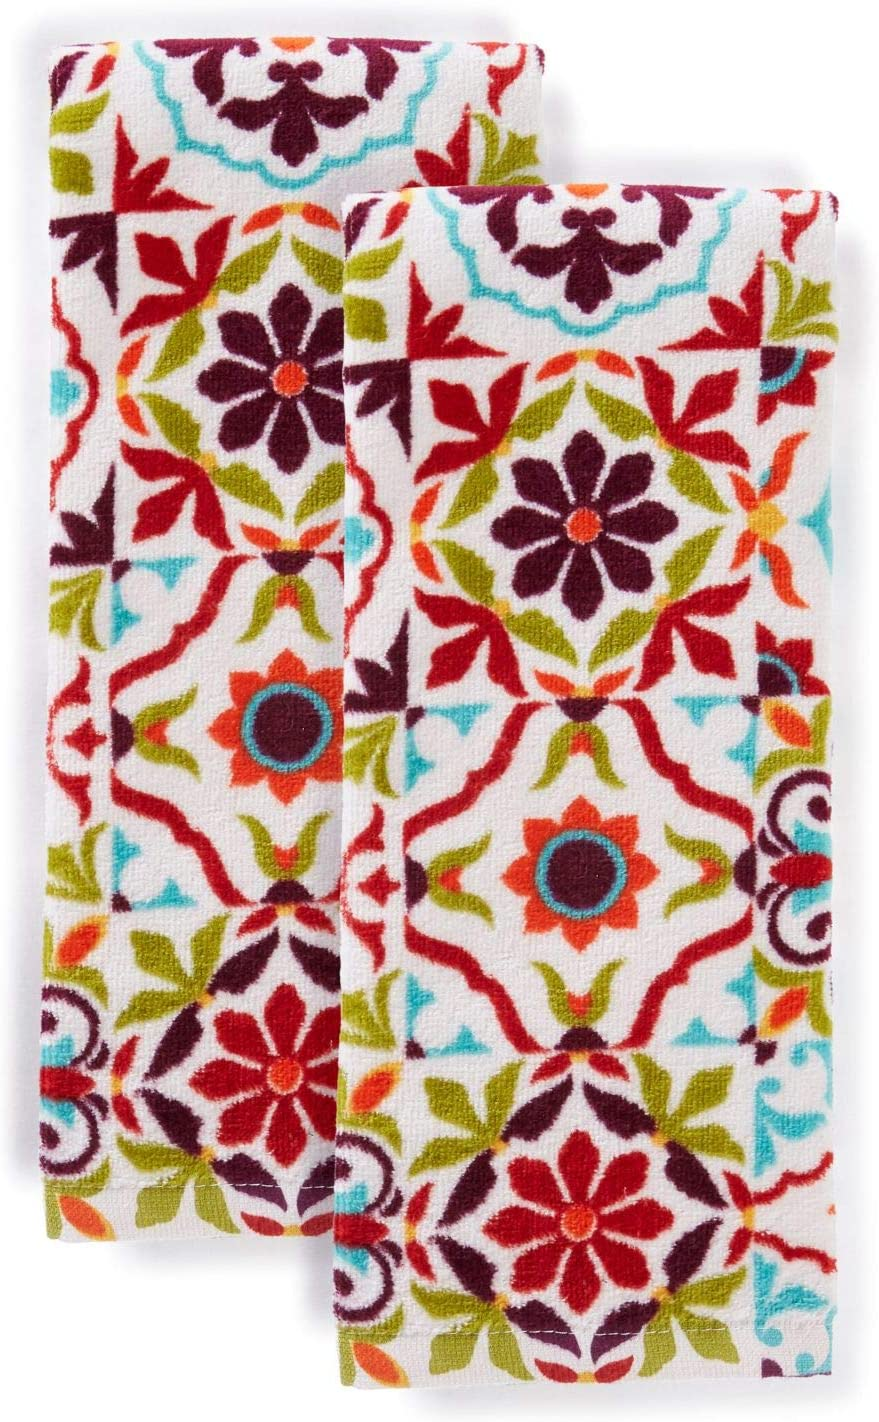 Fiesta Worn Tiles Kitchen Towel Set, 16